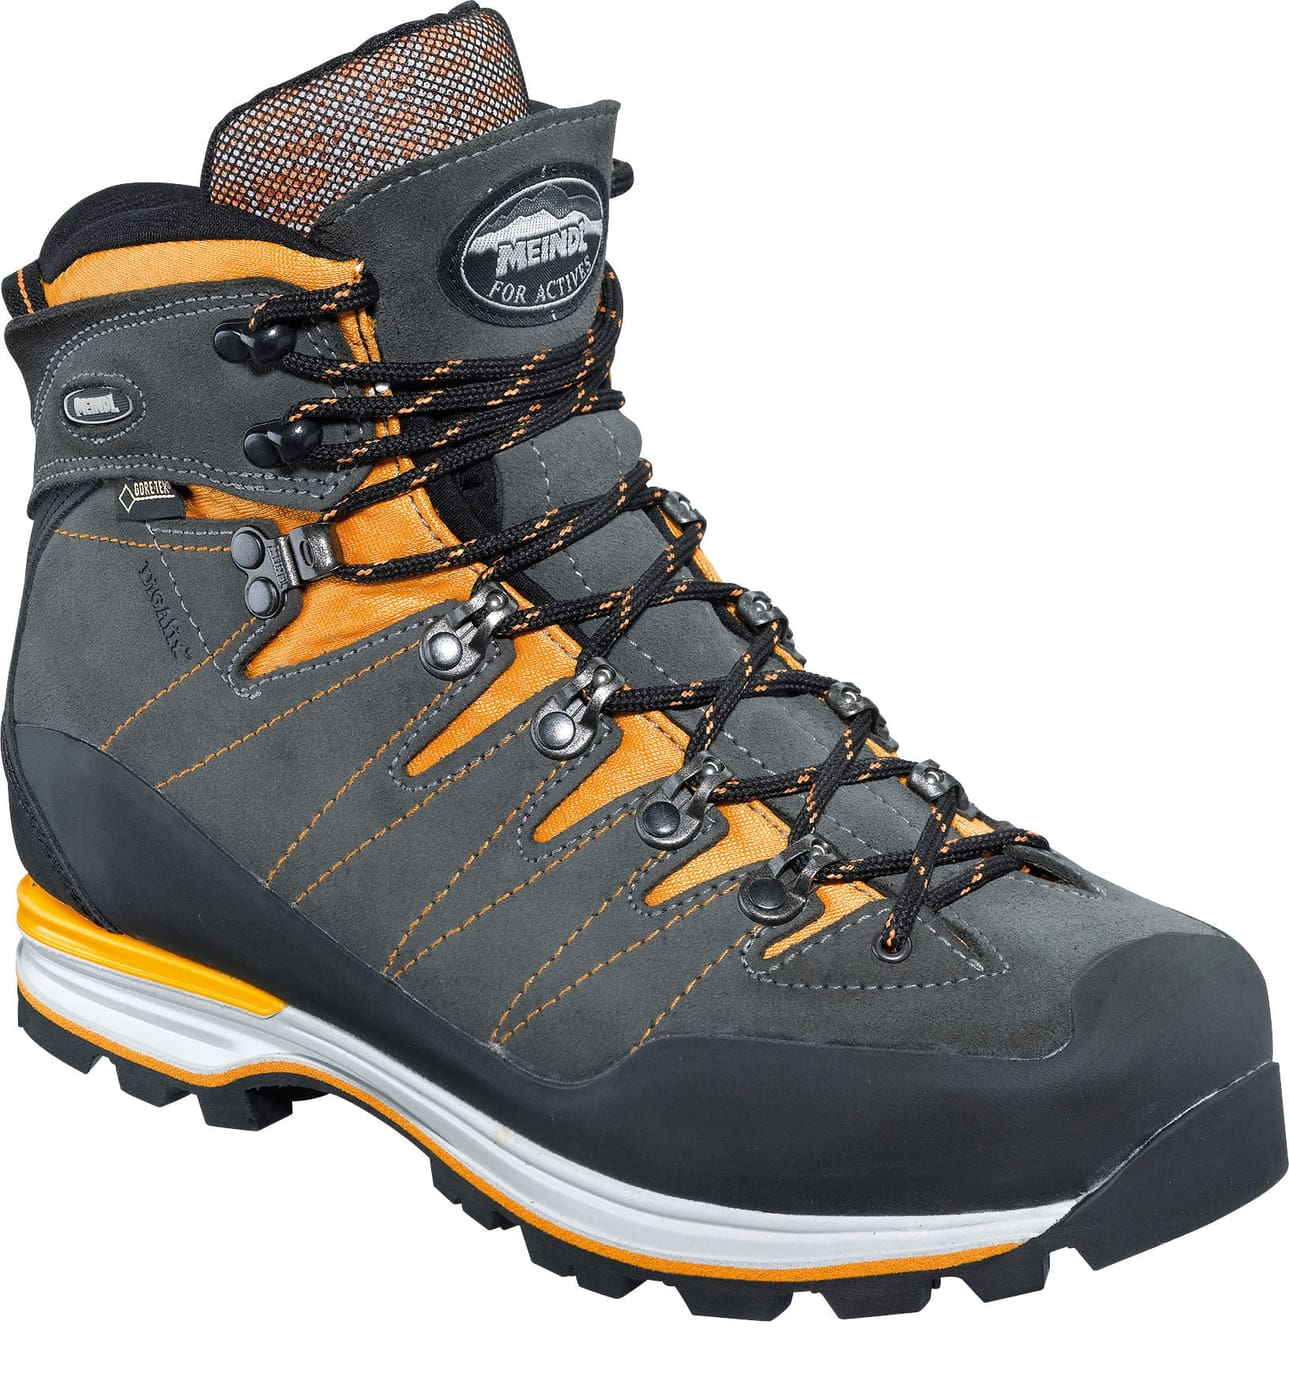 4 Revolution De Chaussures HommeMigros Meindl Air 1 Montagne Pour fgI6mYb7yv